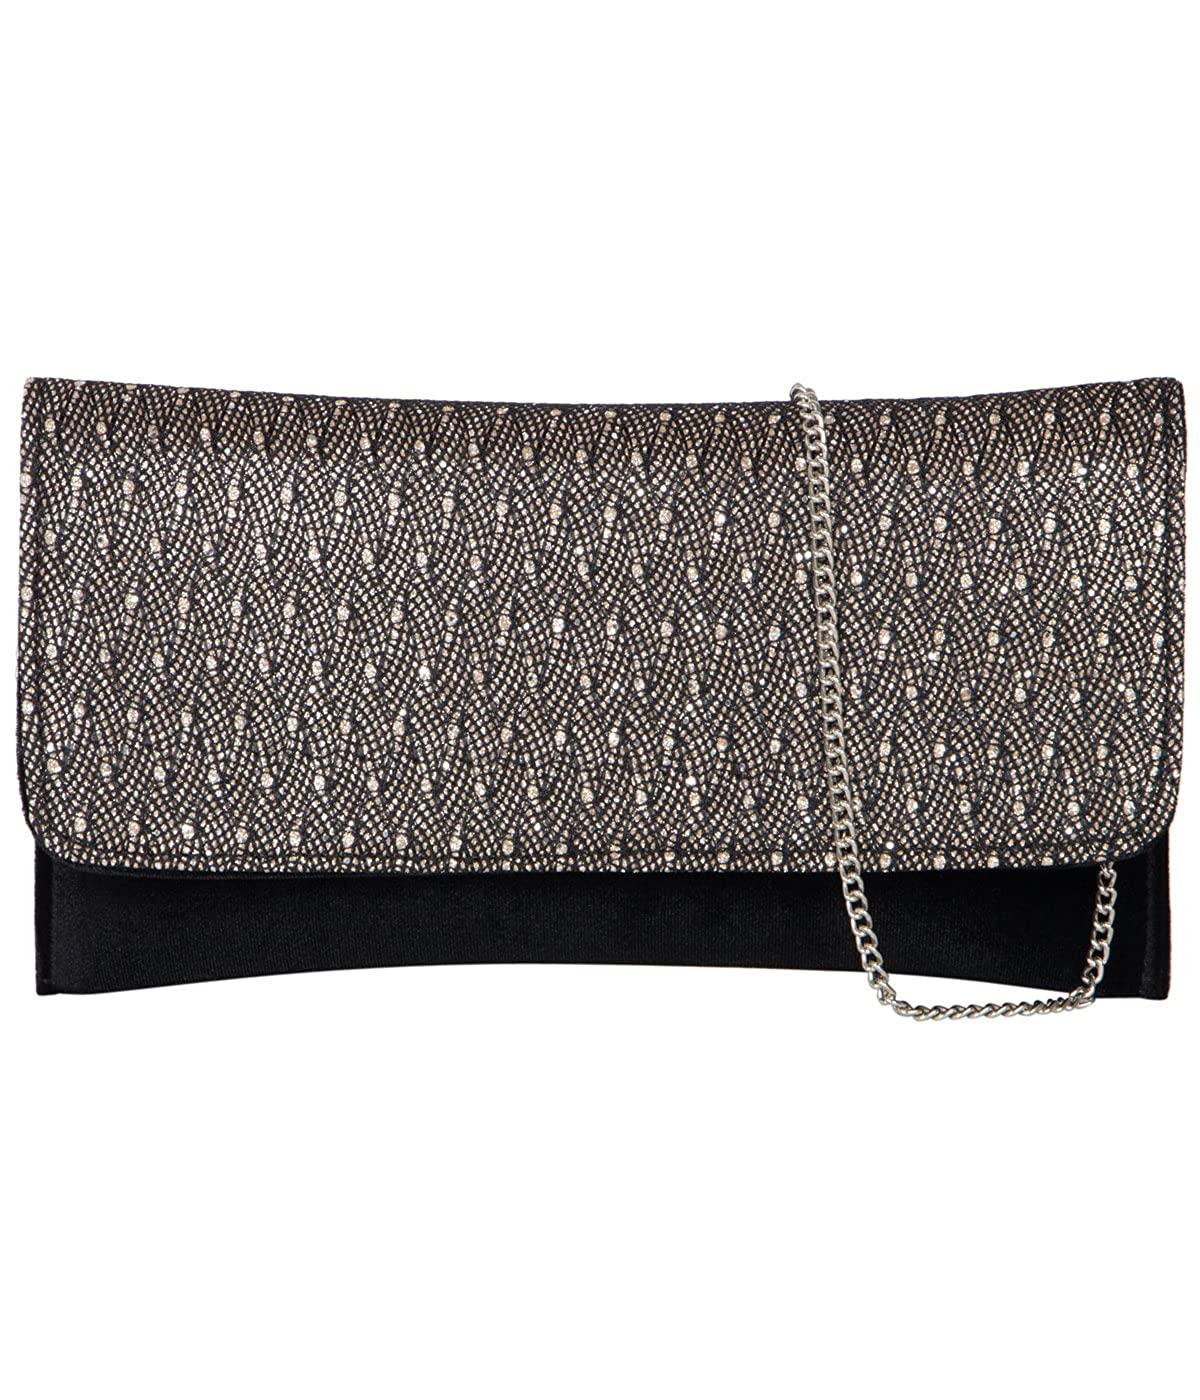 ded48d98f811 ADISA Women s Clutch Sling Bag(Cl006-Cop